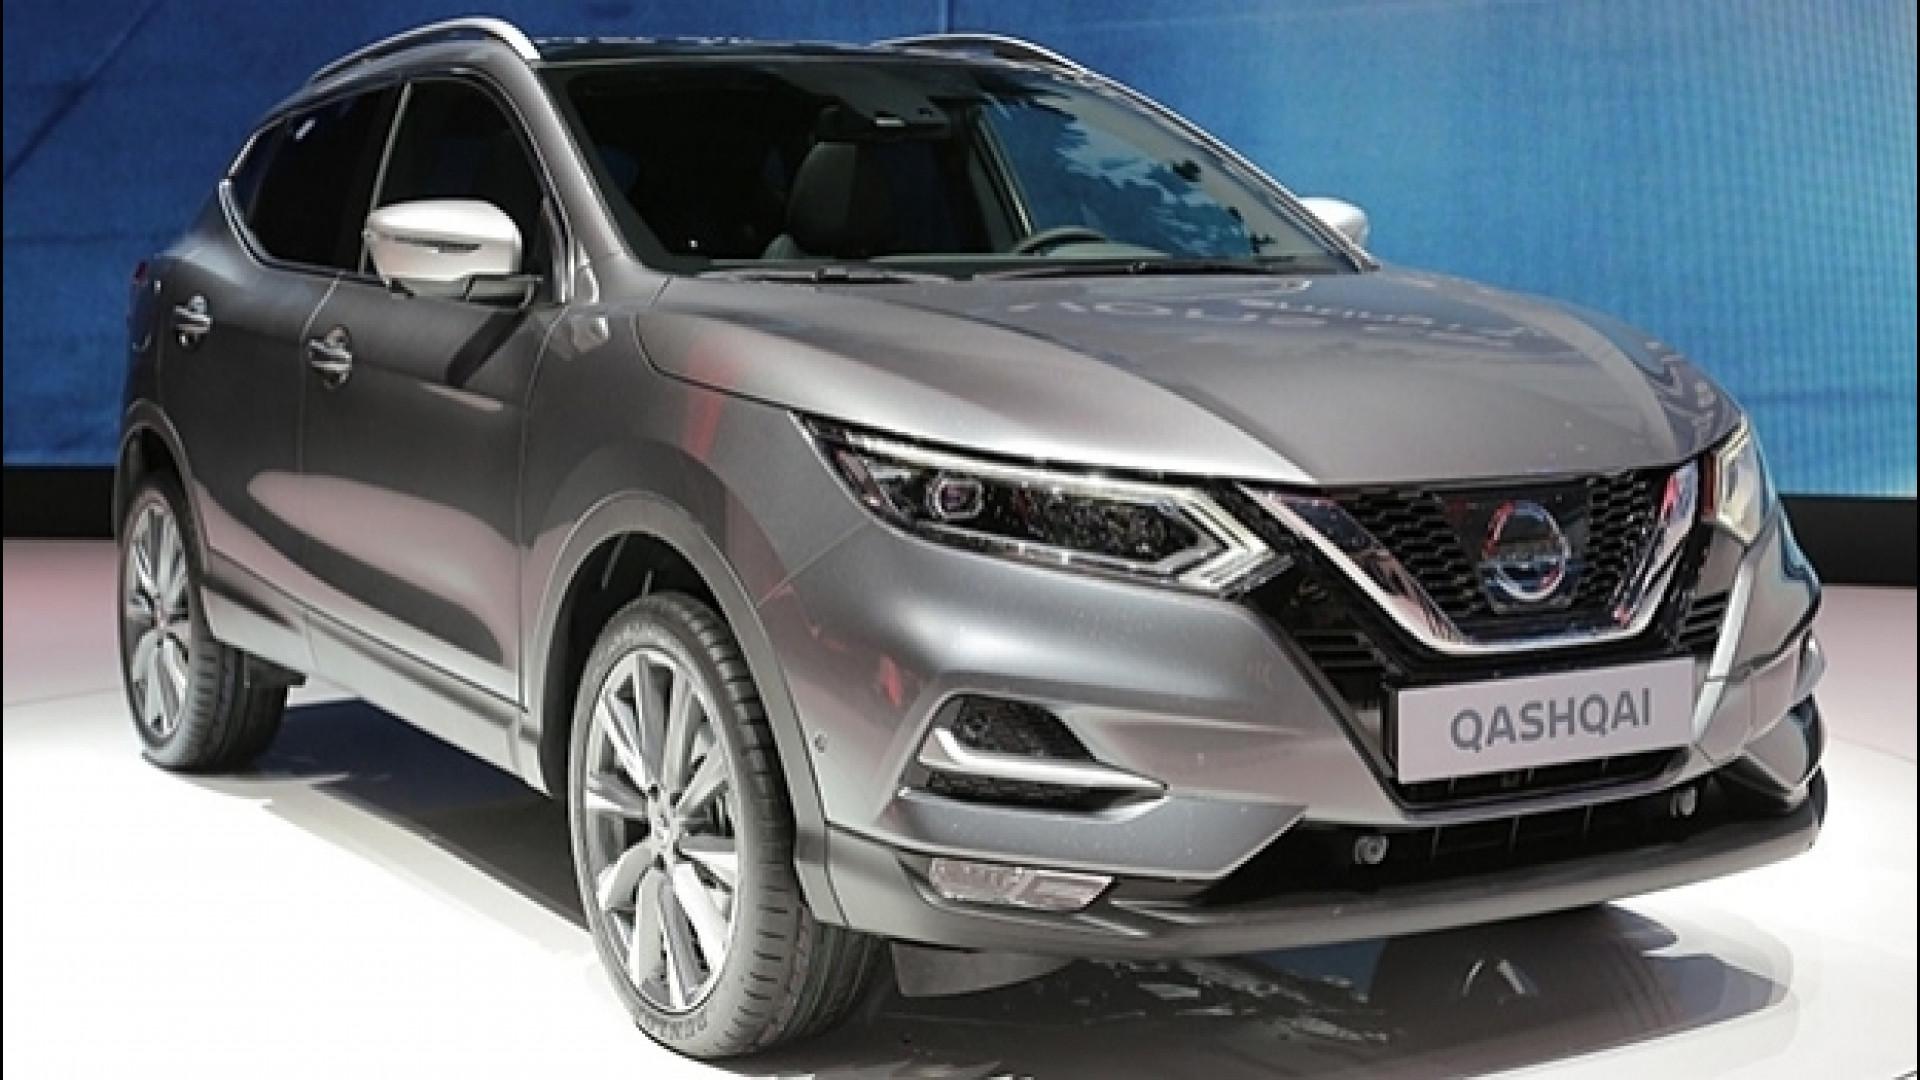 Schema Elettrico Nissan Qashqai : Nissan qashqai restyling differenze per rinnovarsi